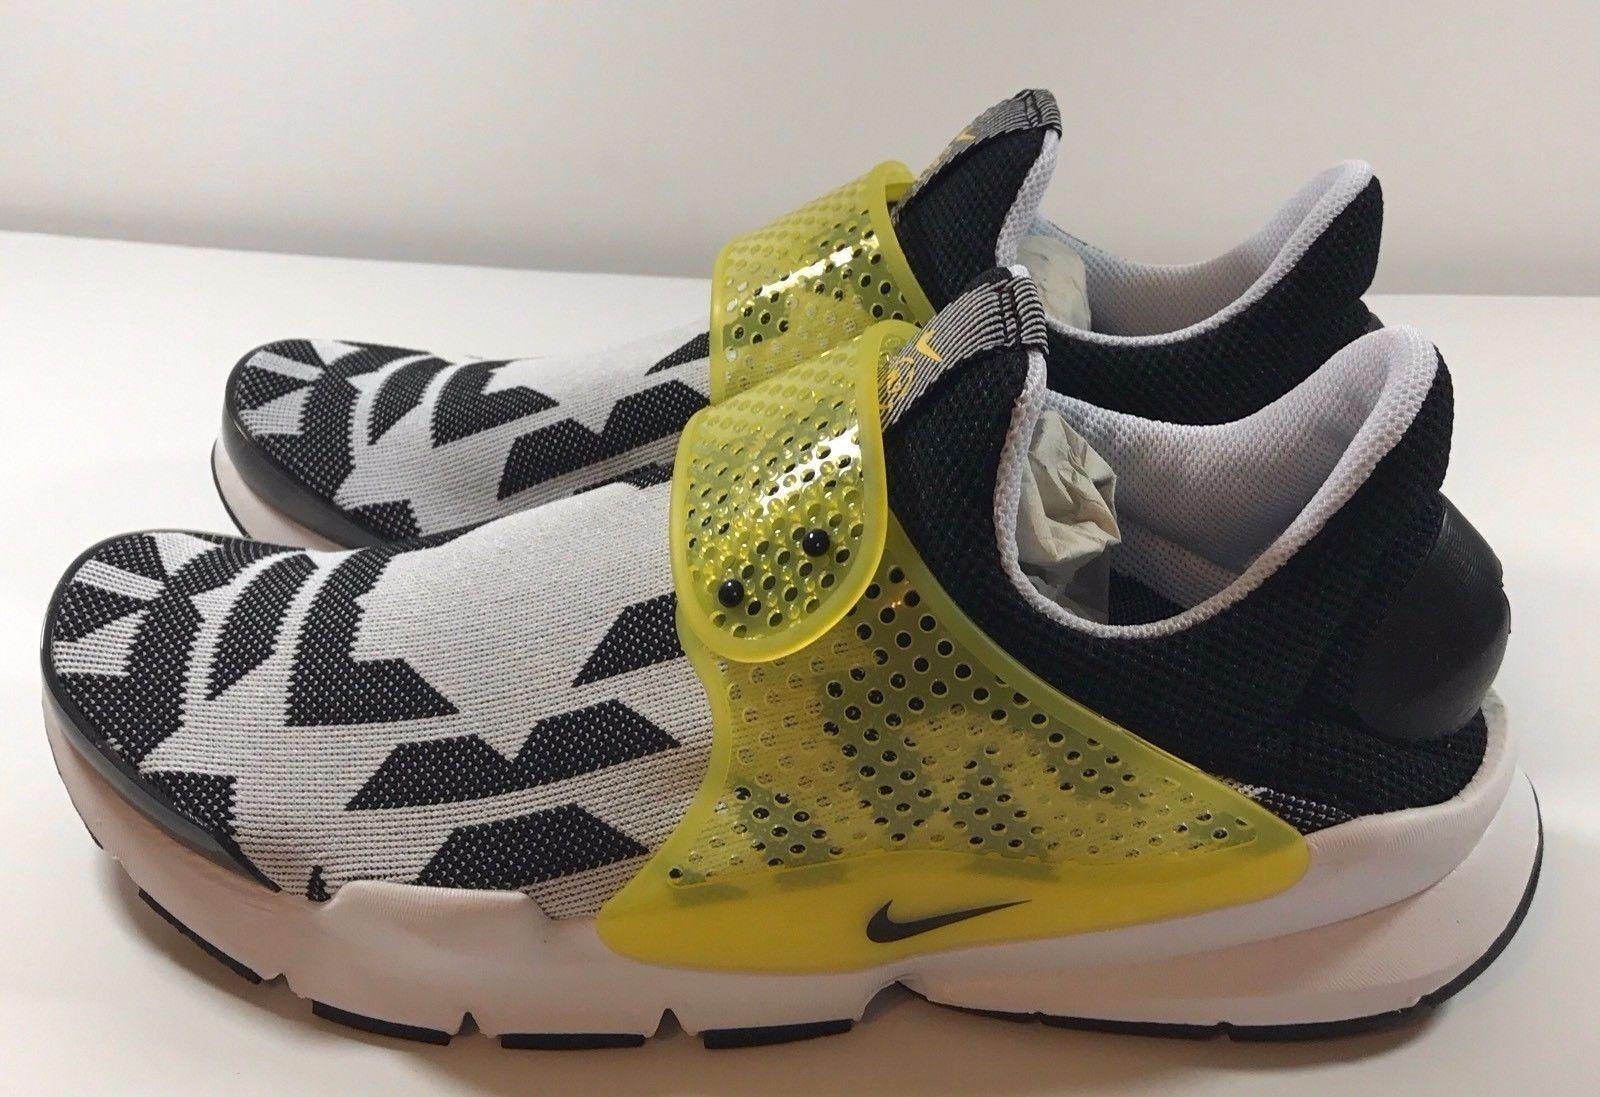 Nike Sock Dart GPX N7 White Varsity Maize Black 908660-117 Size 13